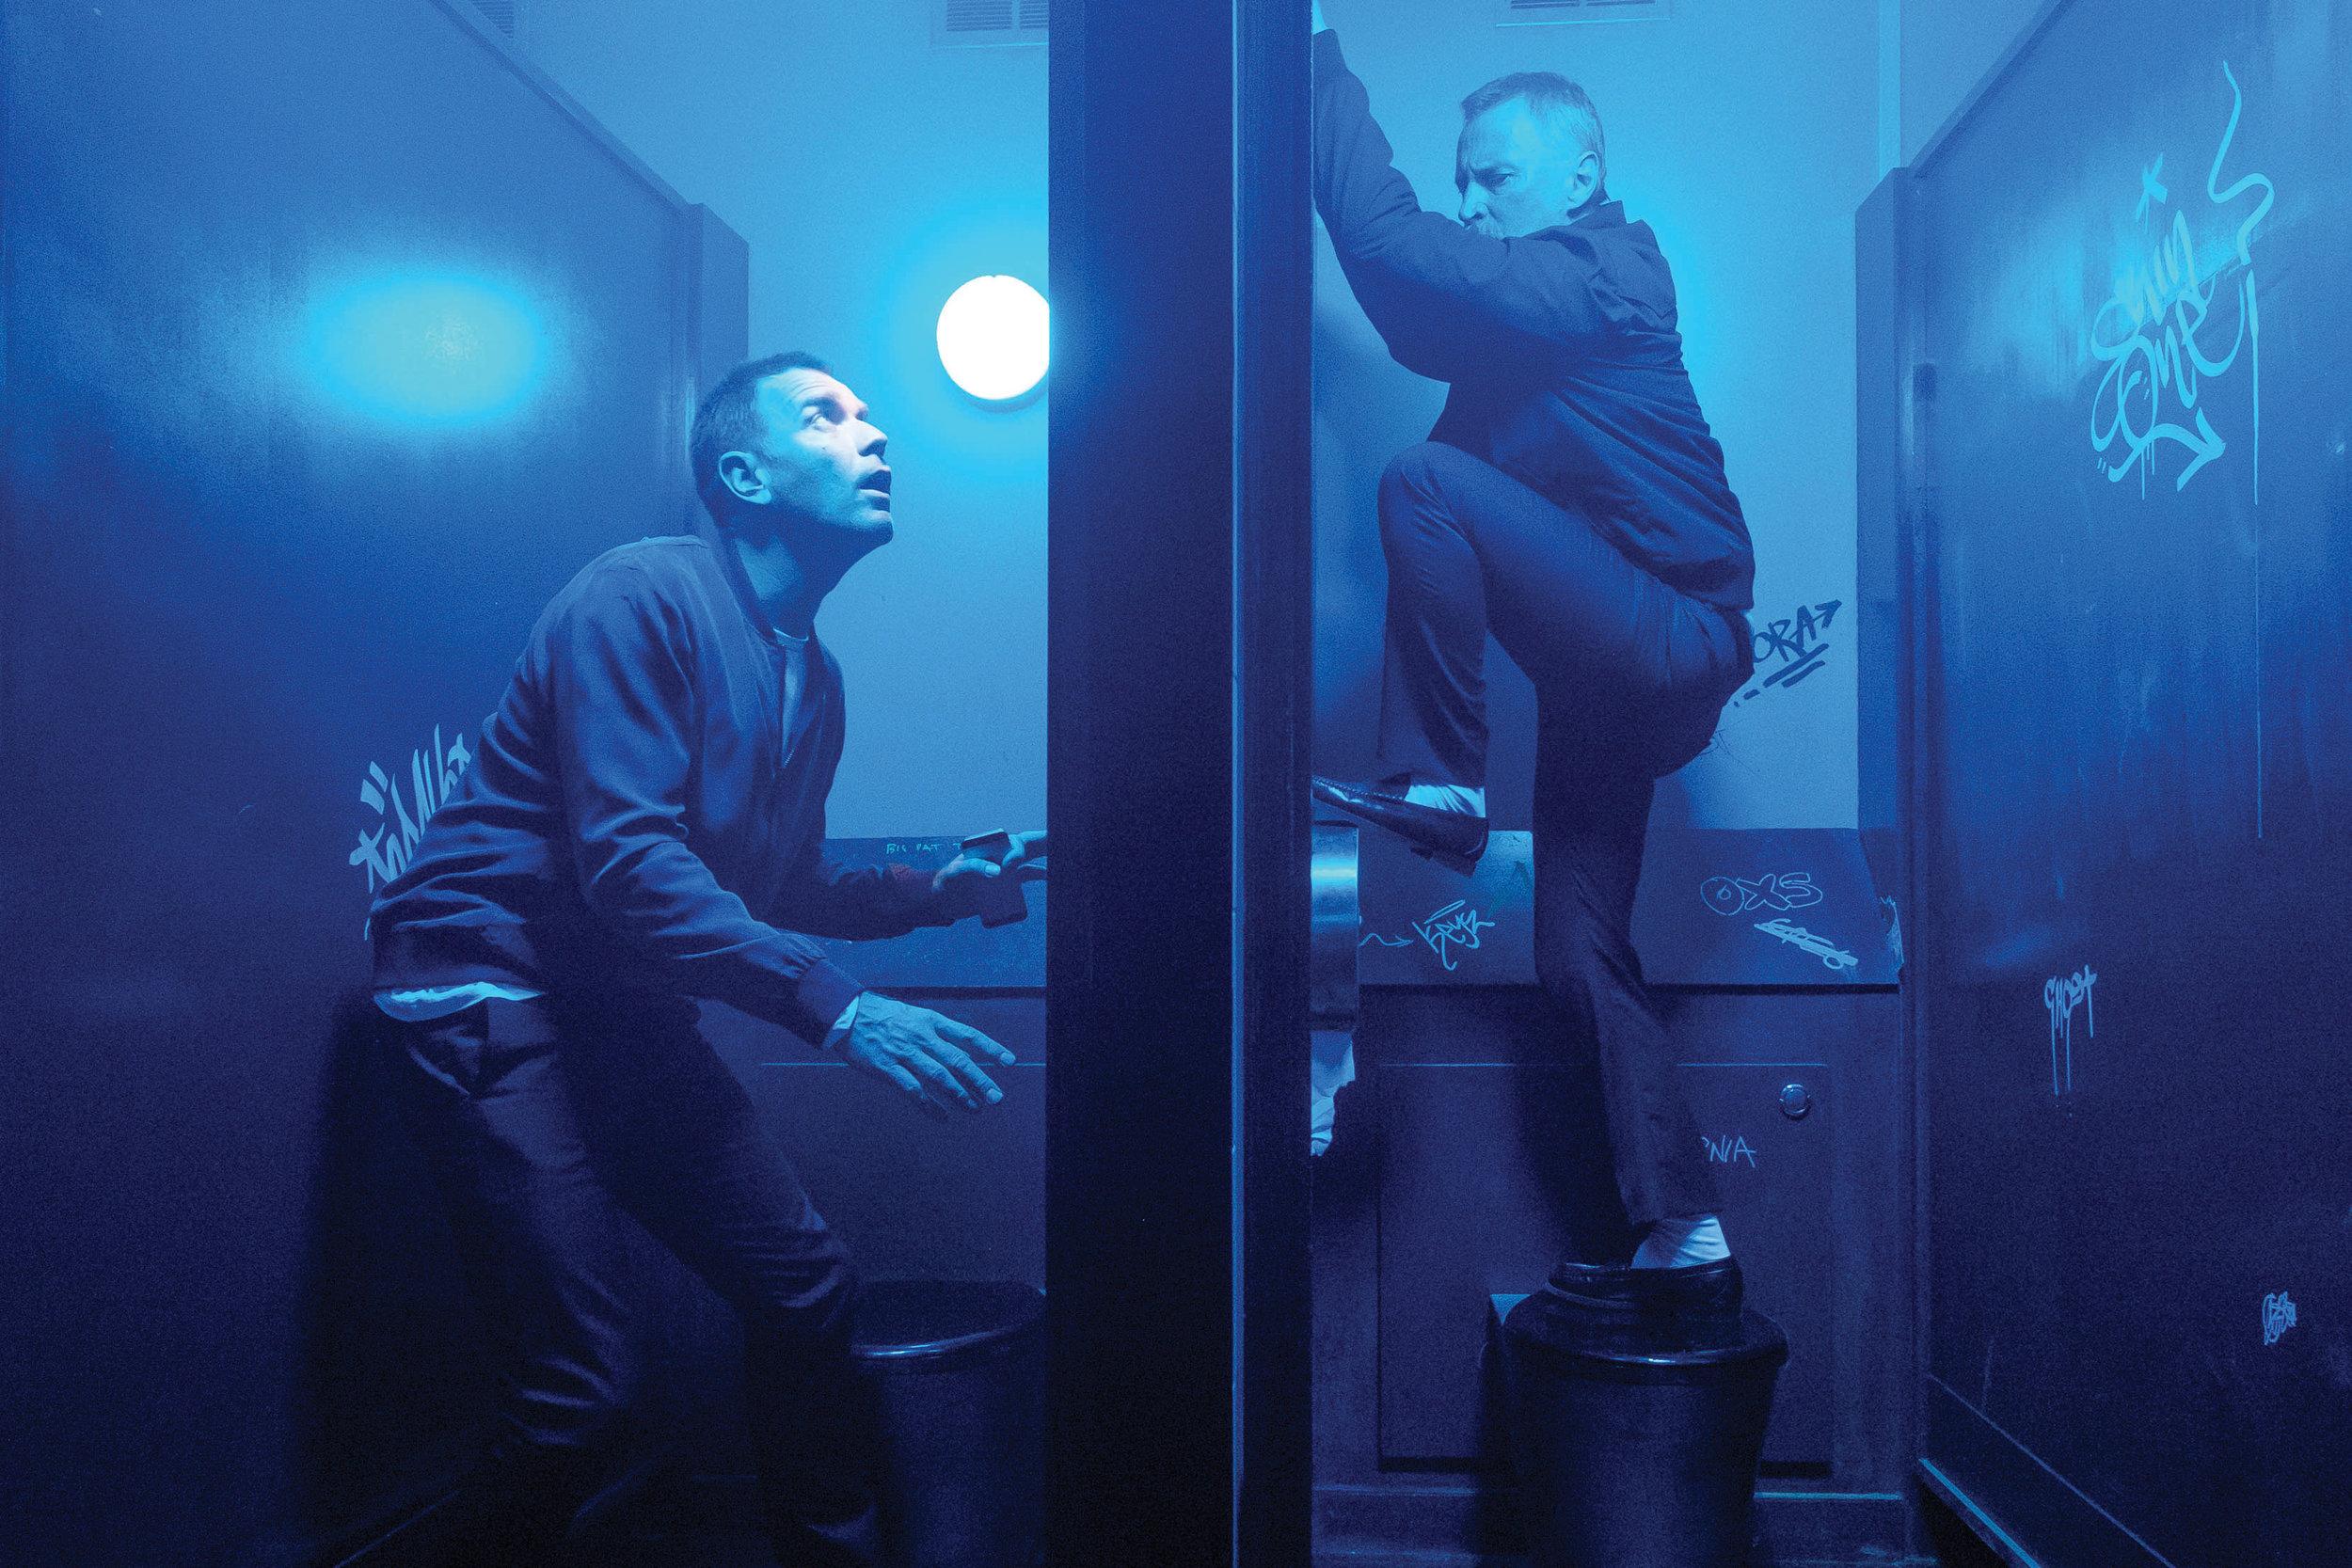 Mark Renton (Ewan McGregor) and Begbie (Robert Carlyle).